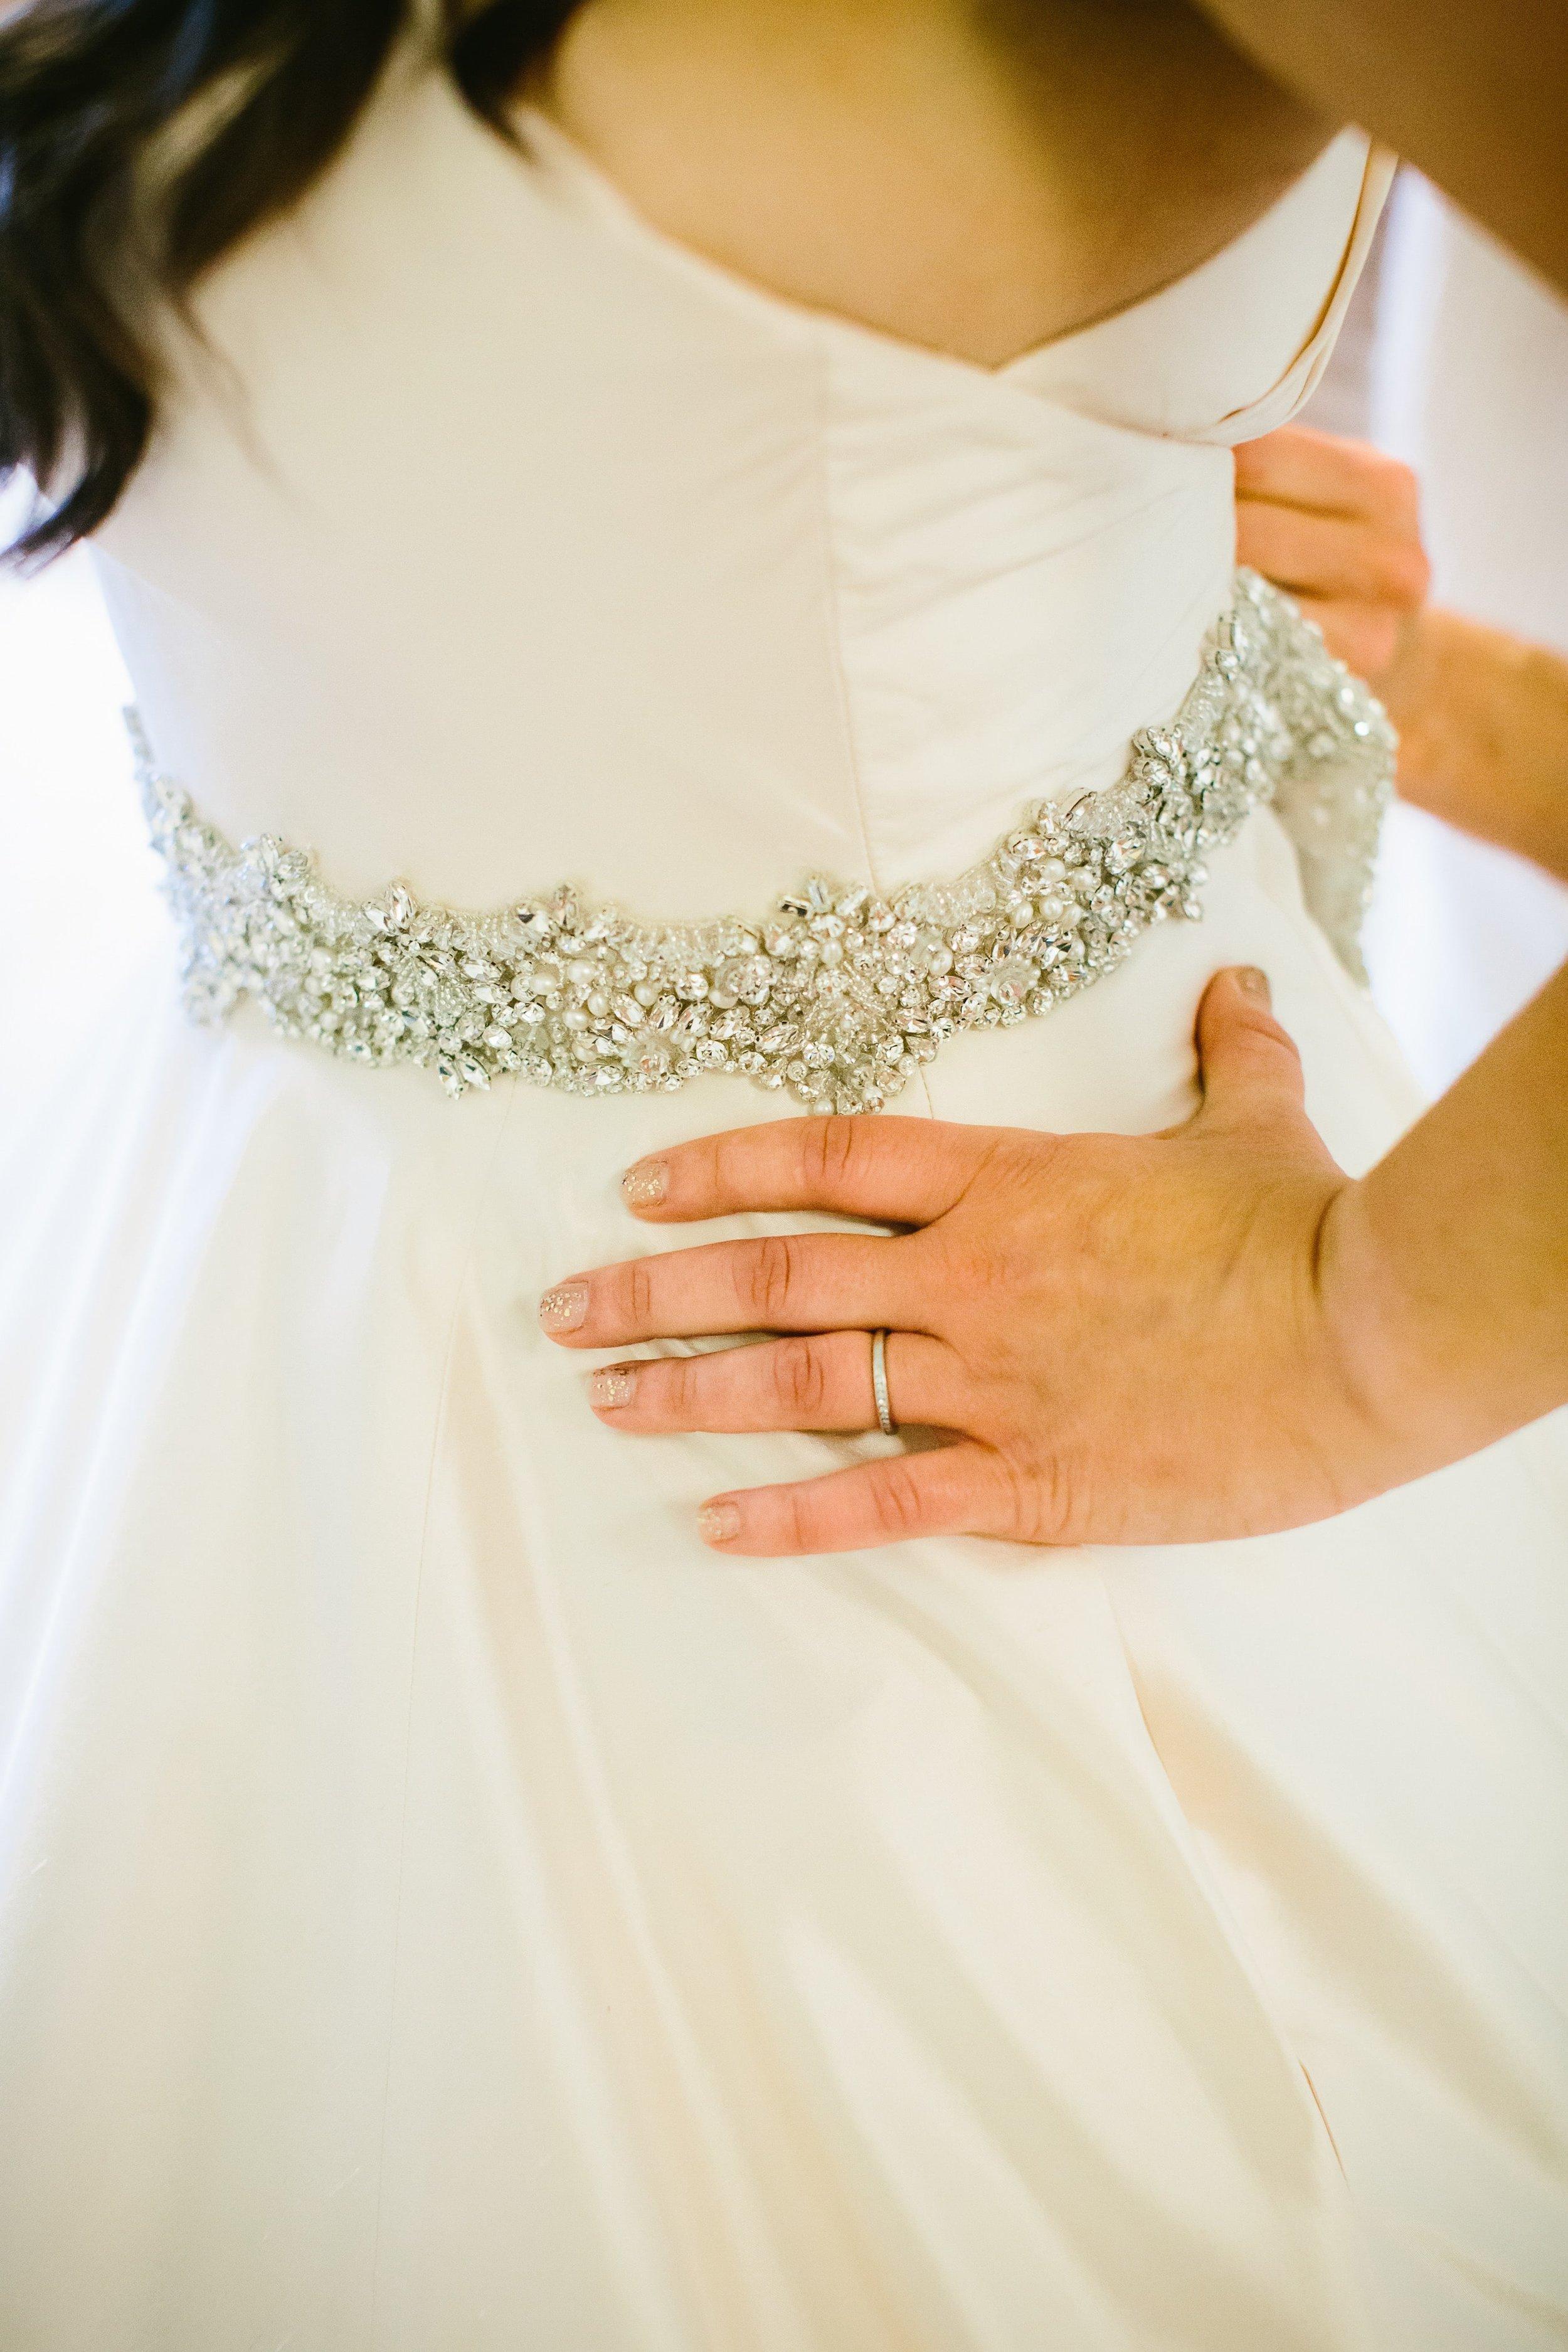 4 Tiffany engagement ring, glitter nail polish, and Watters crystal belt